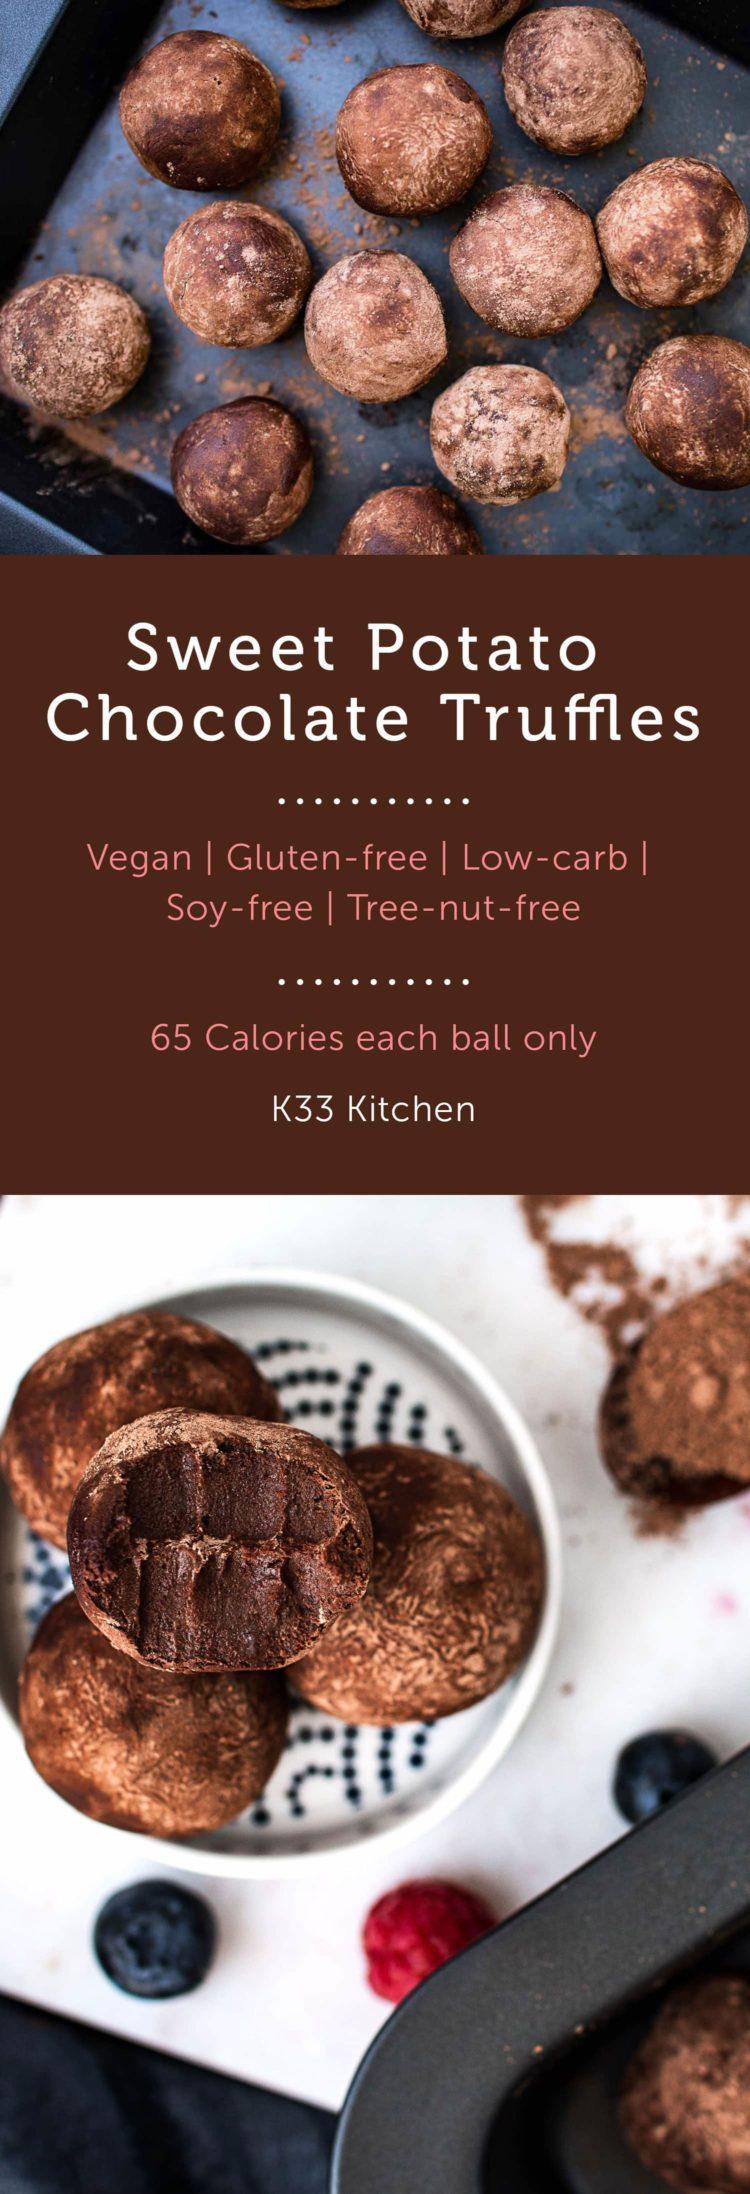 K33 Kitchen Sweet potato chocolate truffles